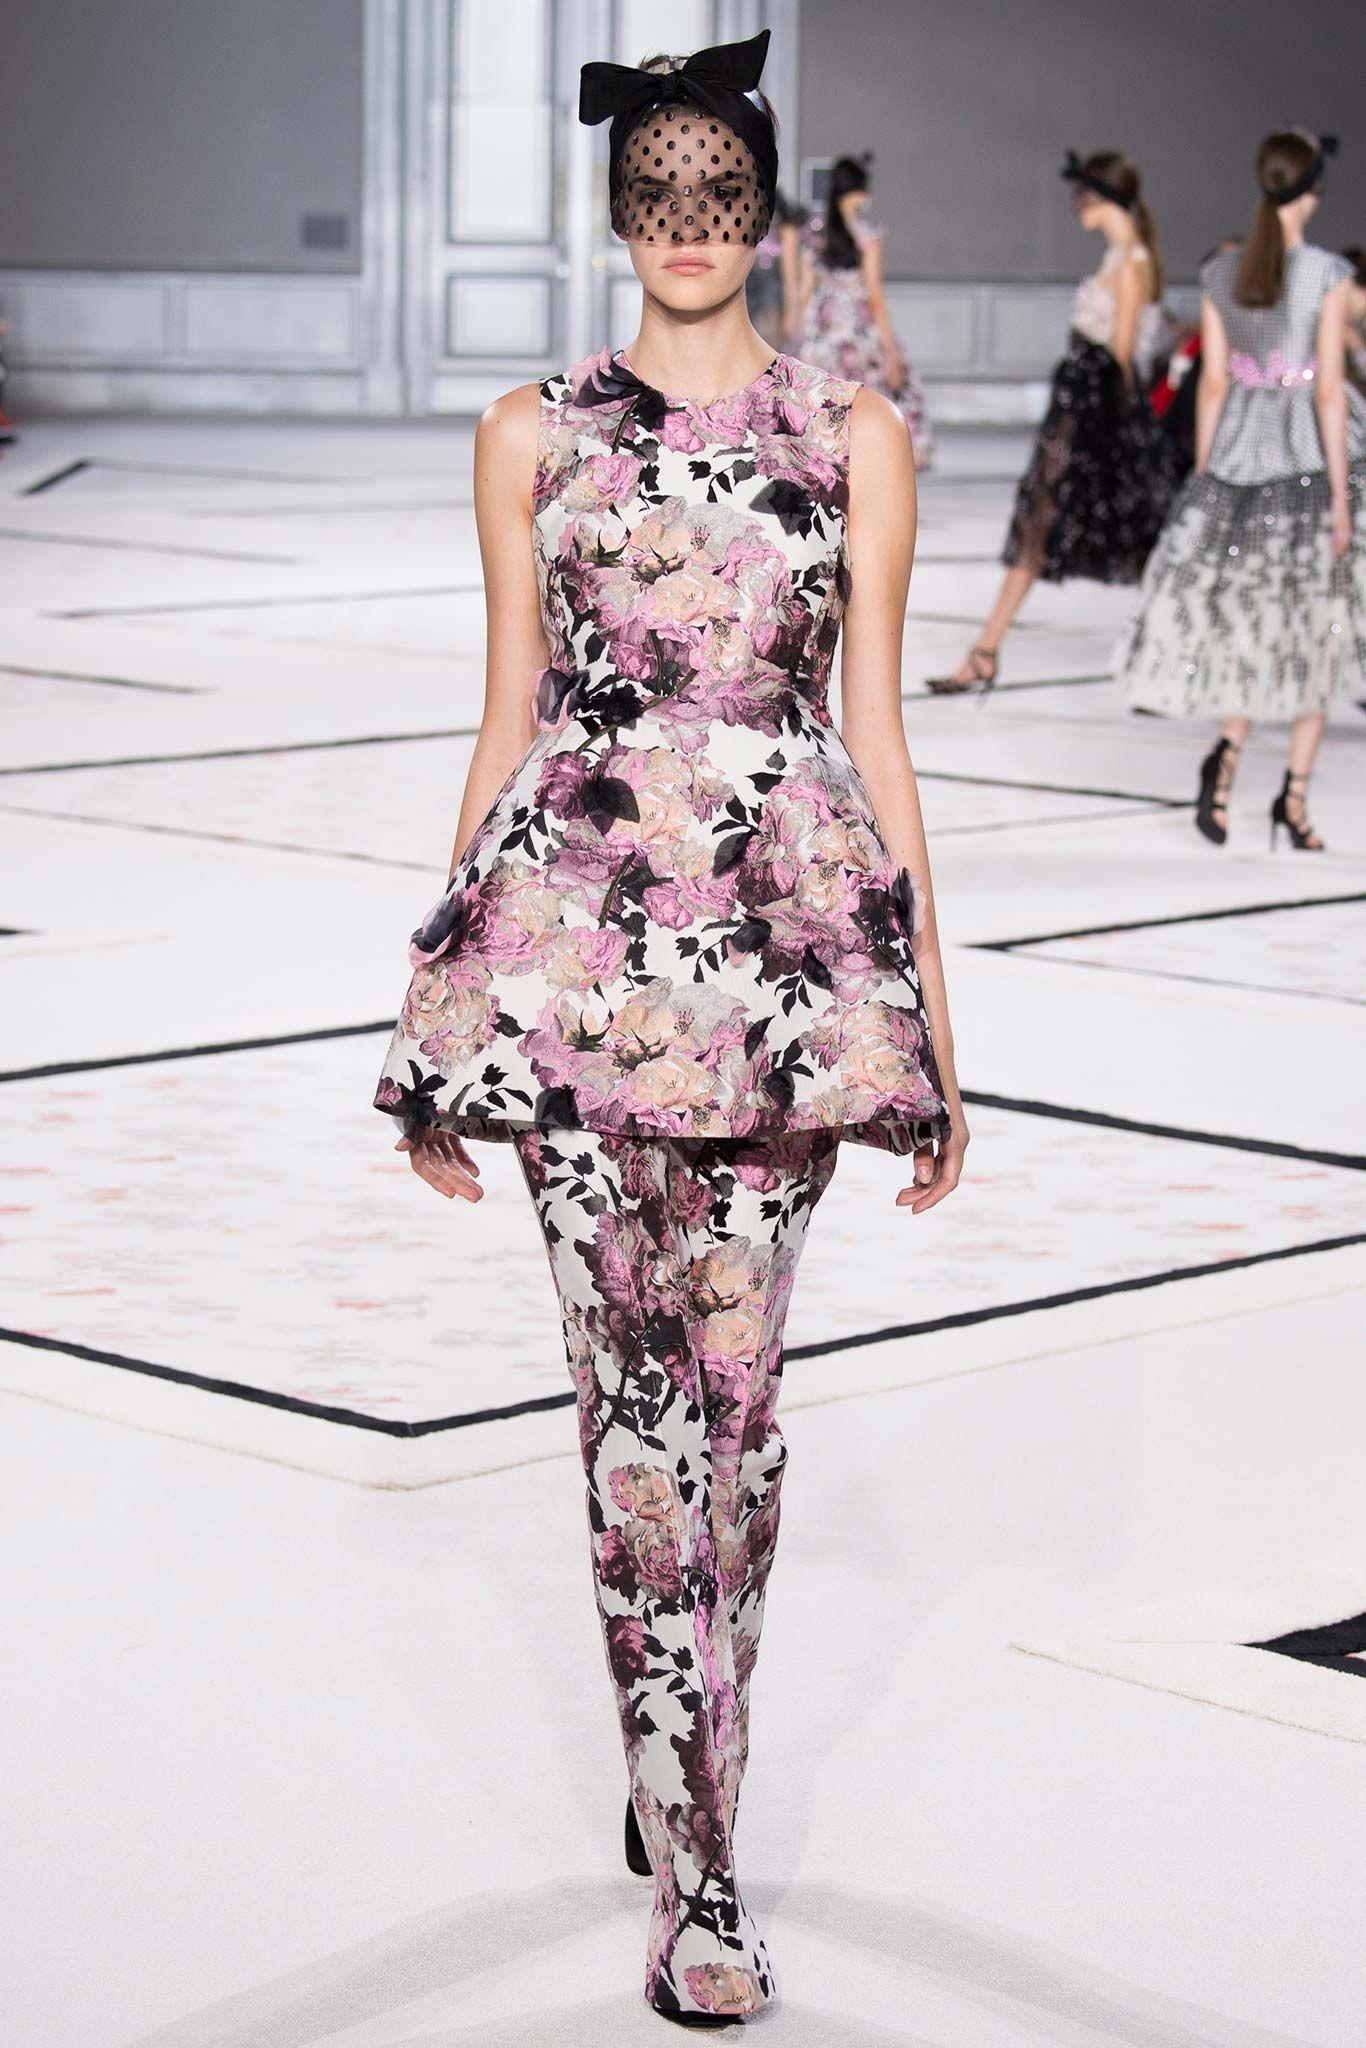 Giambattista Valli Couture SpringSummer 2015 Collection